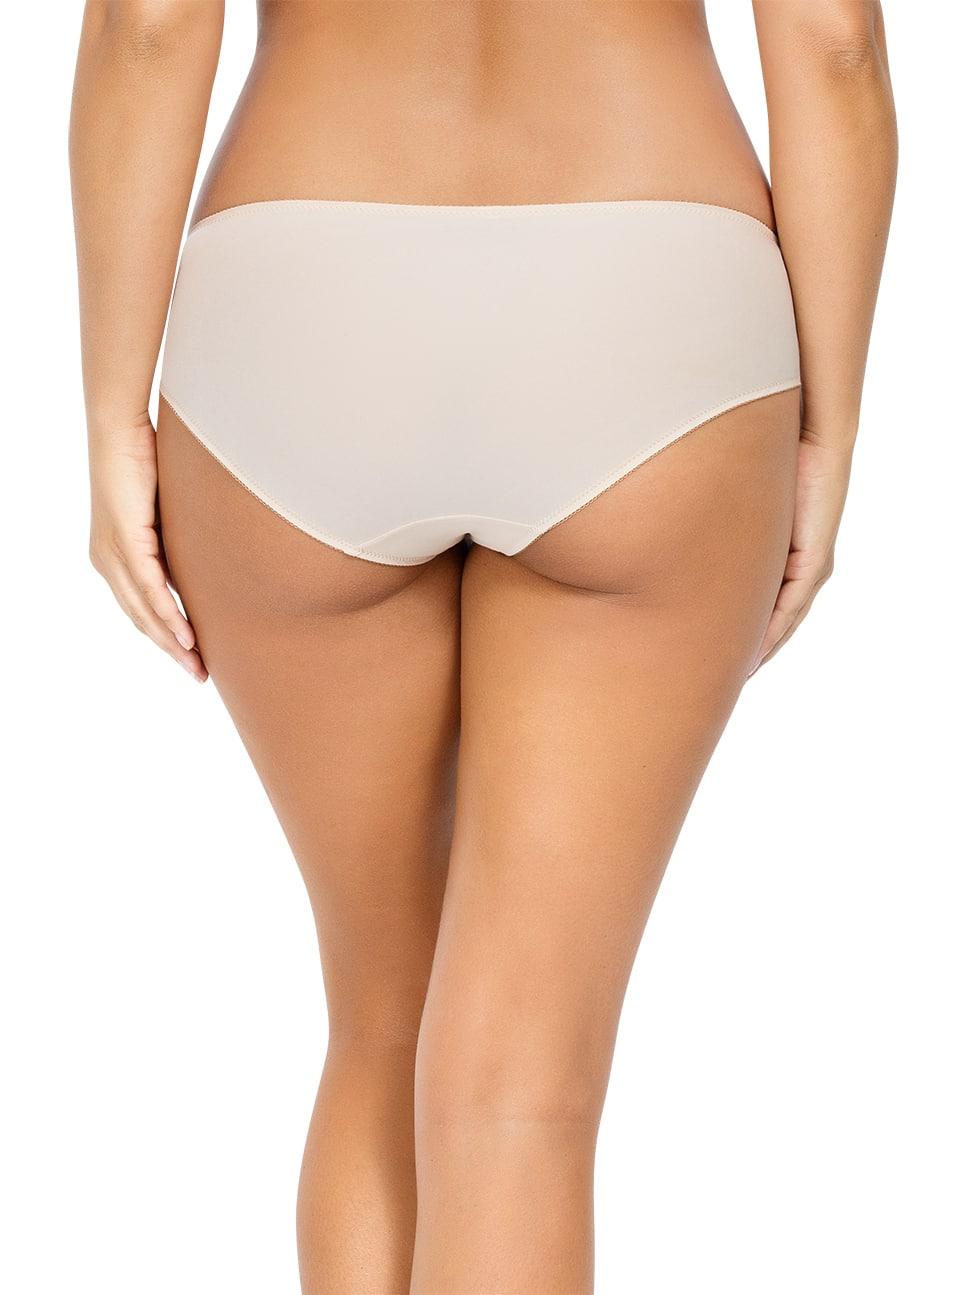 PARFAIT Cora BikiniP5633 Bare Back - Cora Bikini - Bare - P5633